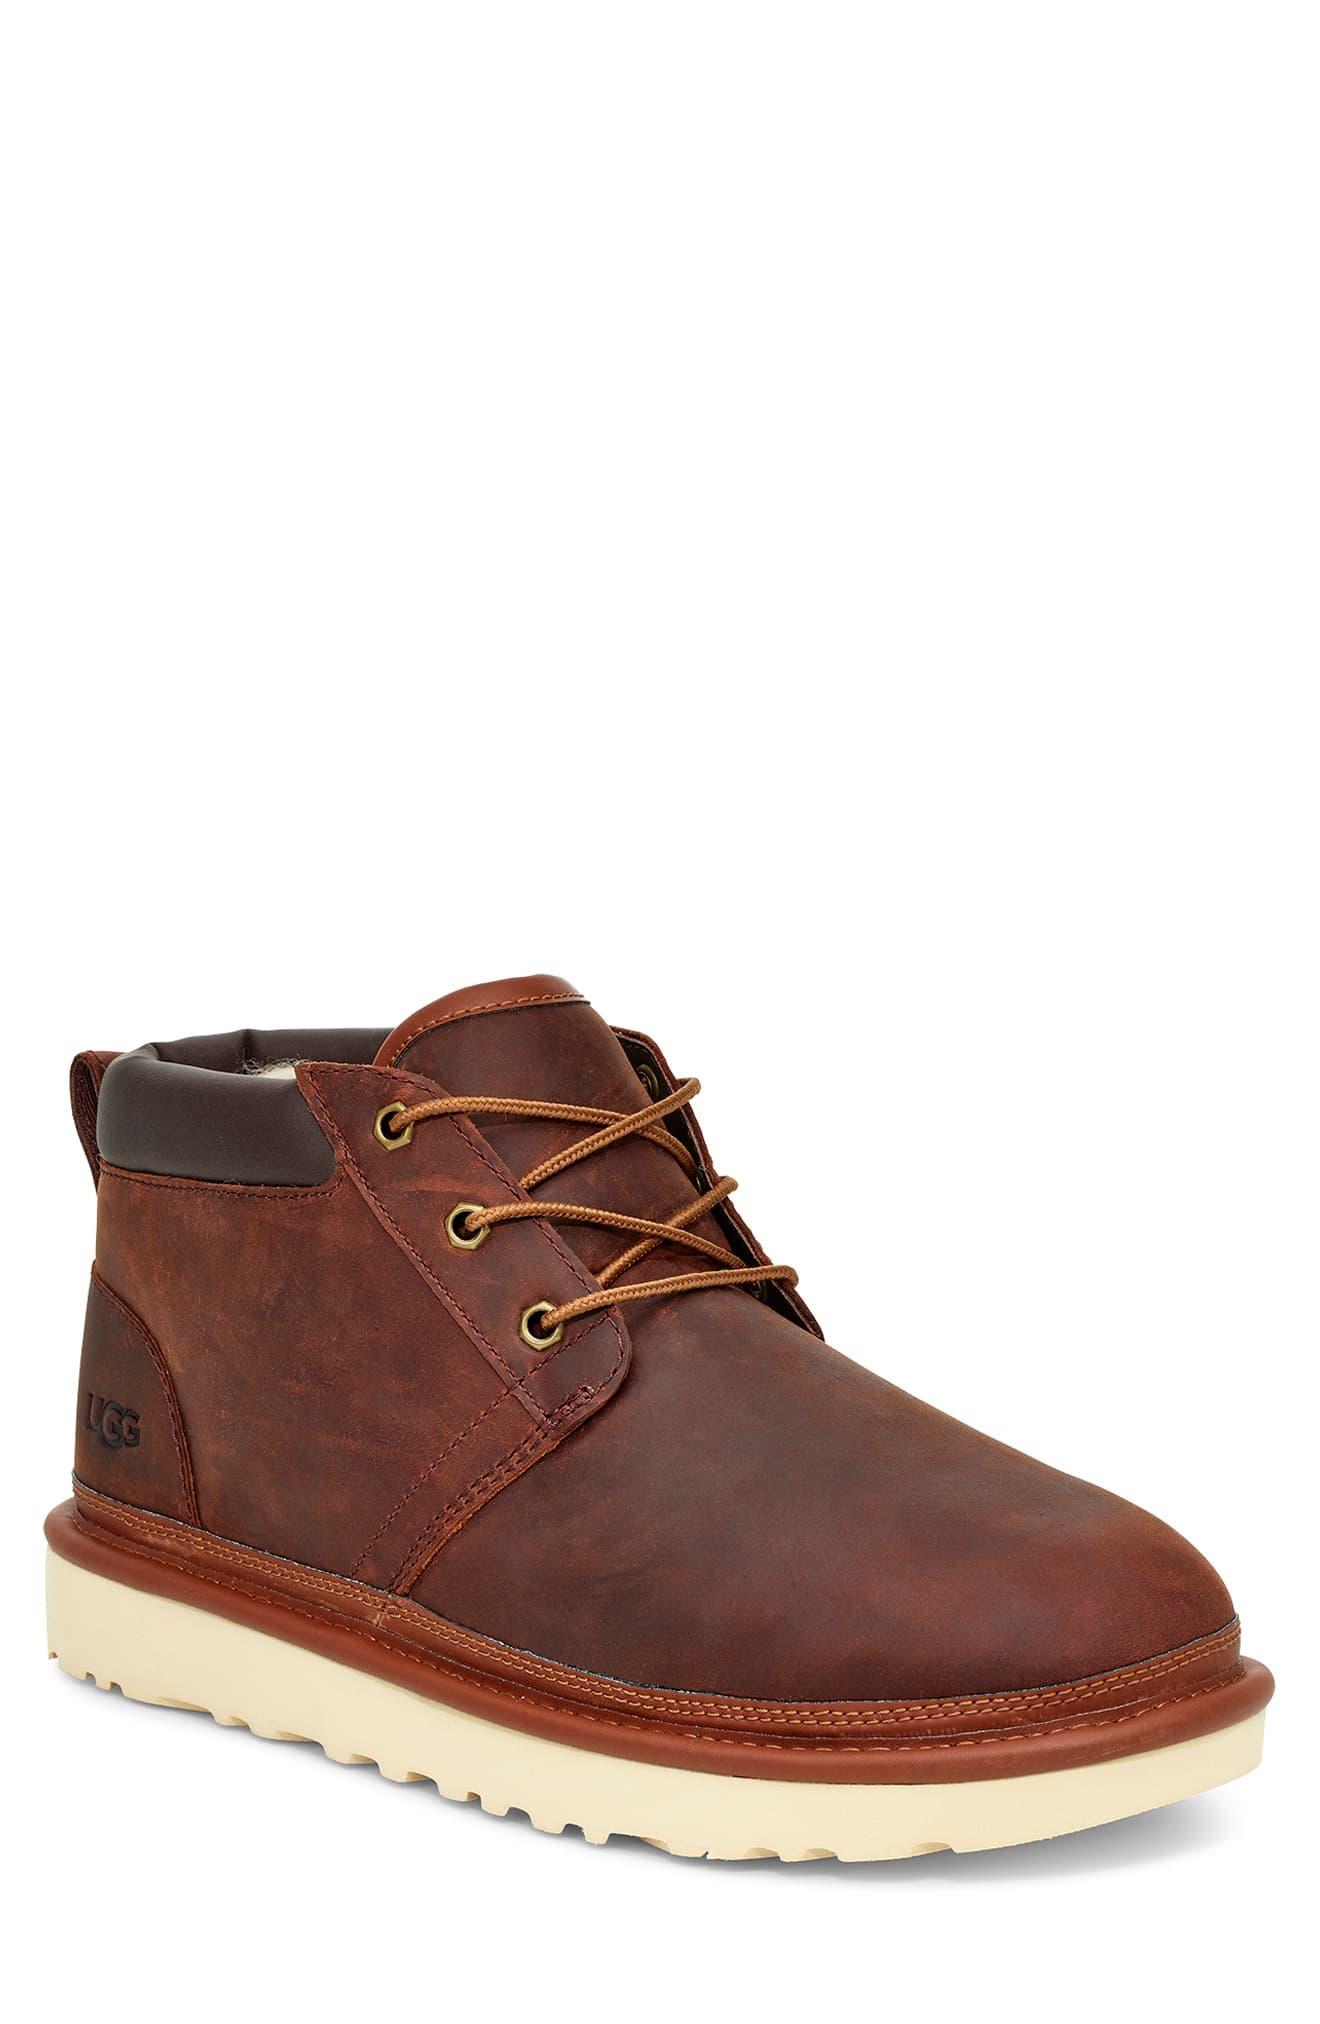 Men S Ugg Neumel Utility Chukka Boot Size 8 M Brown